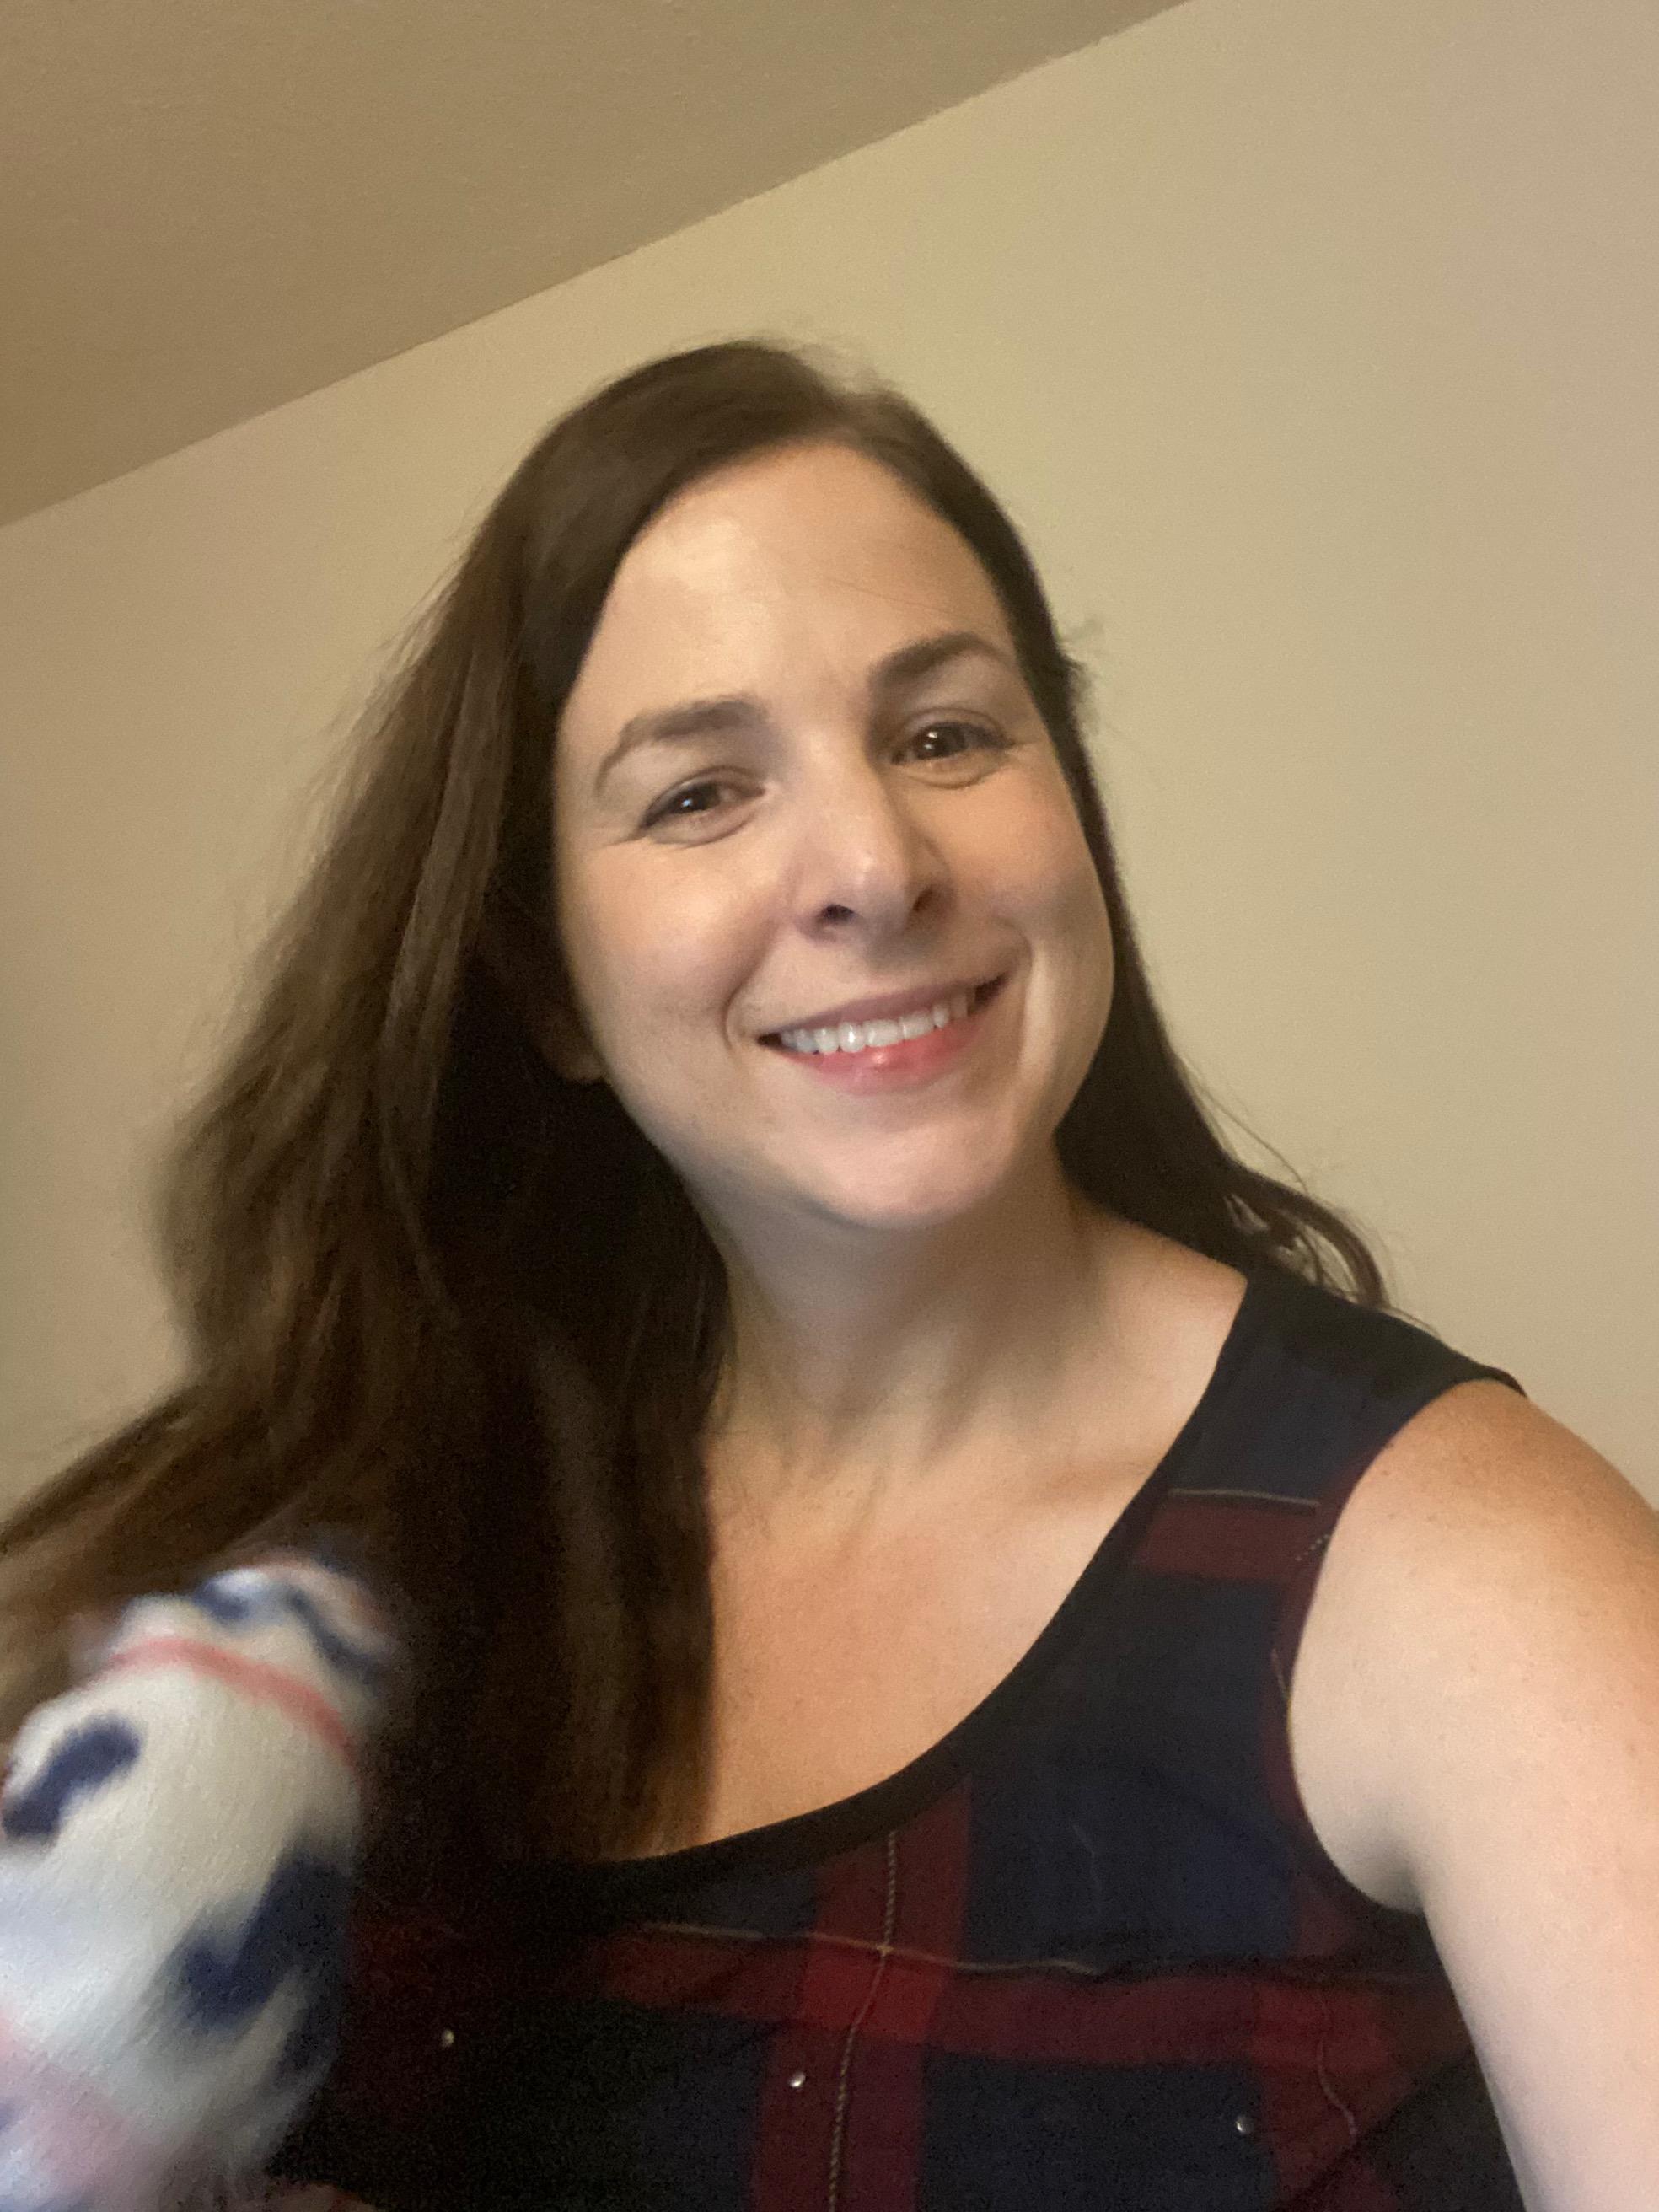 Katie Lee Occupational Therapist Swift Health 11